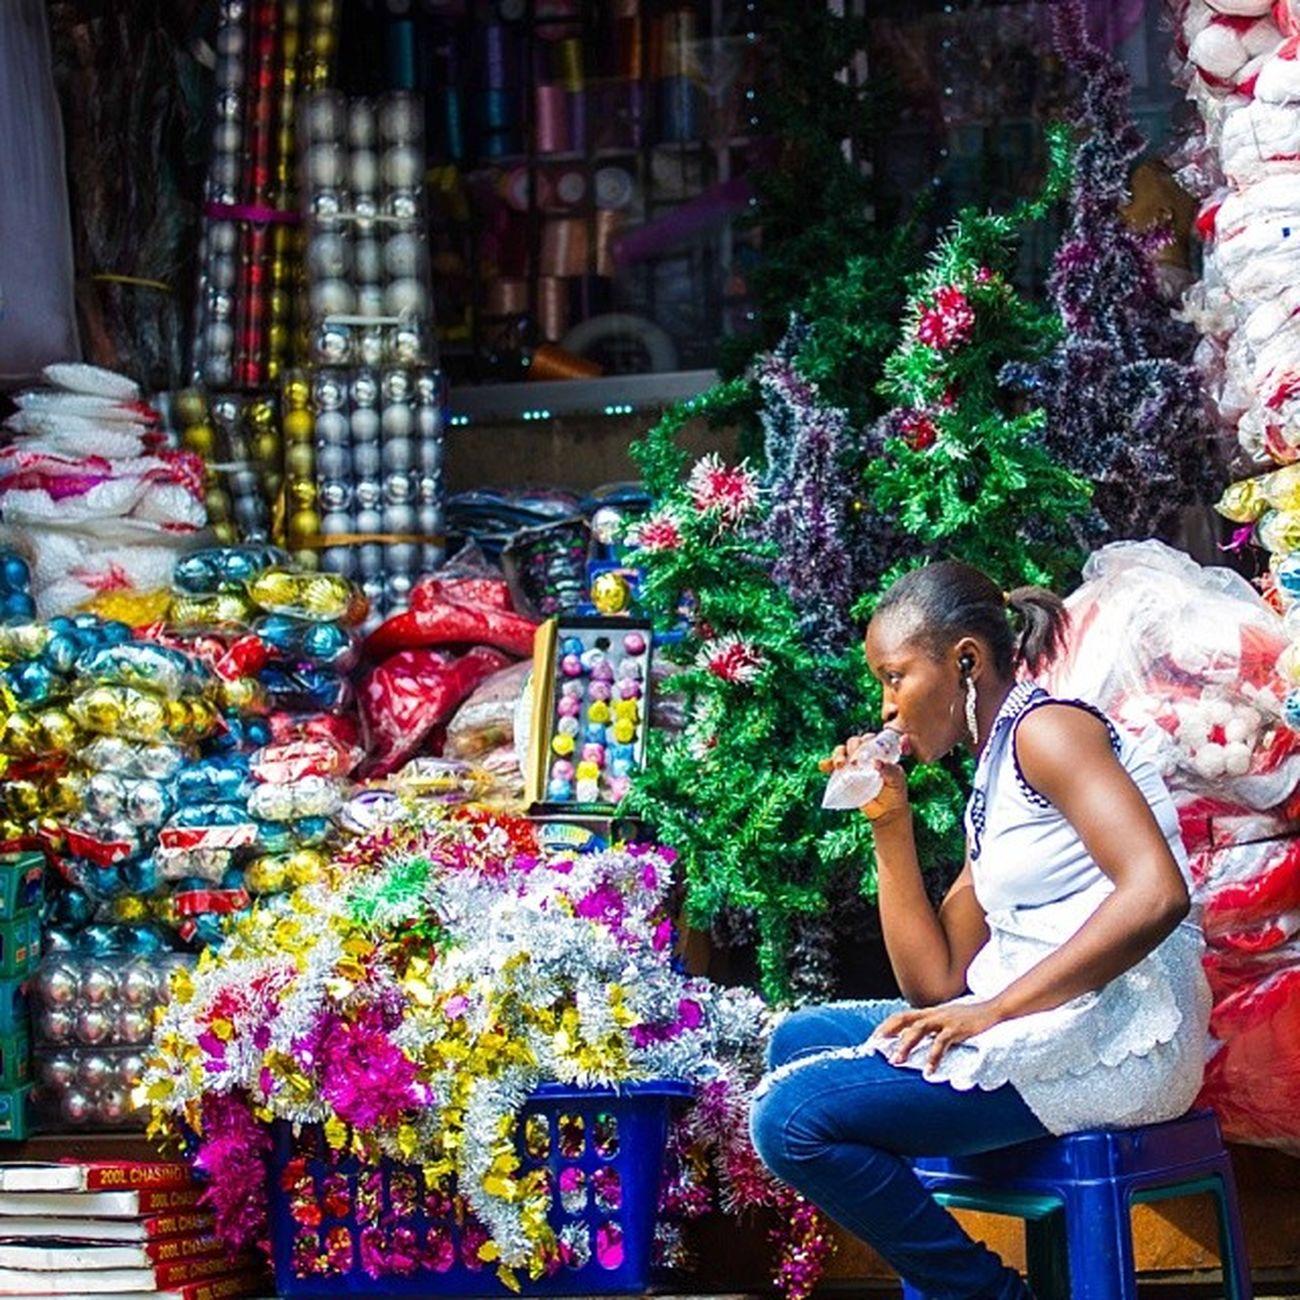 Christmas shop in Lagos. ChristmasInLagos LagosIsland Lagos Nigeria nigerianwomen africanwoman africa streetphotography